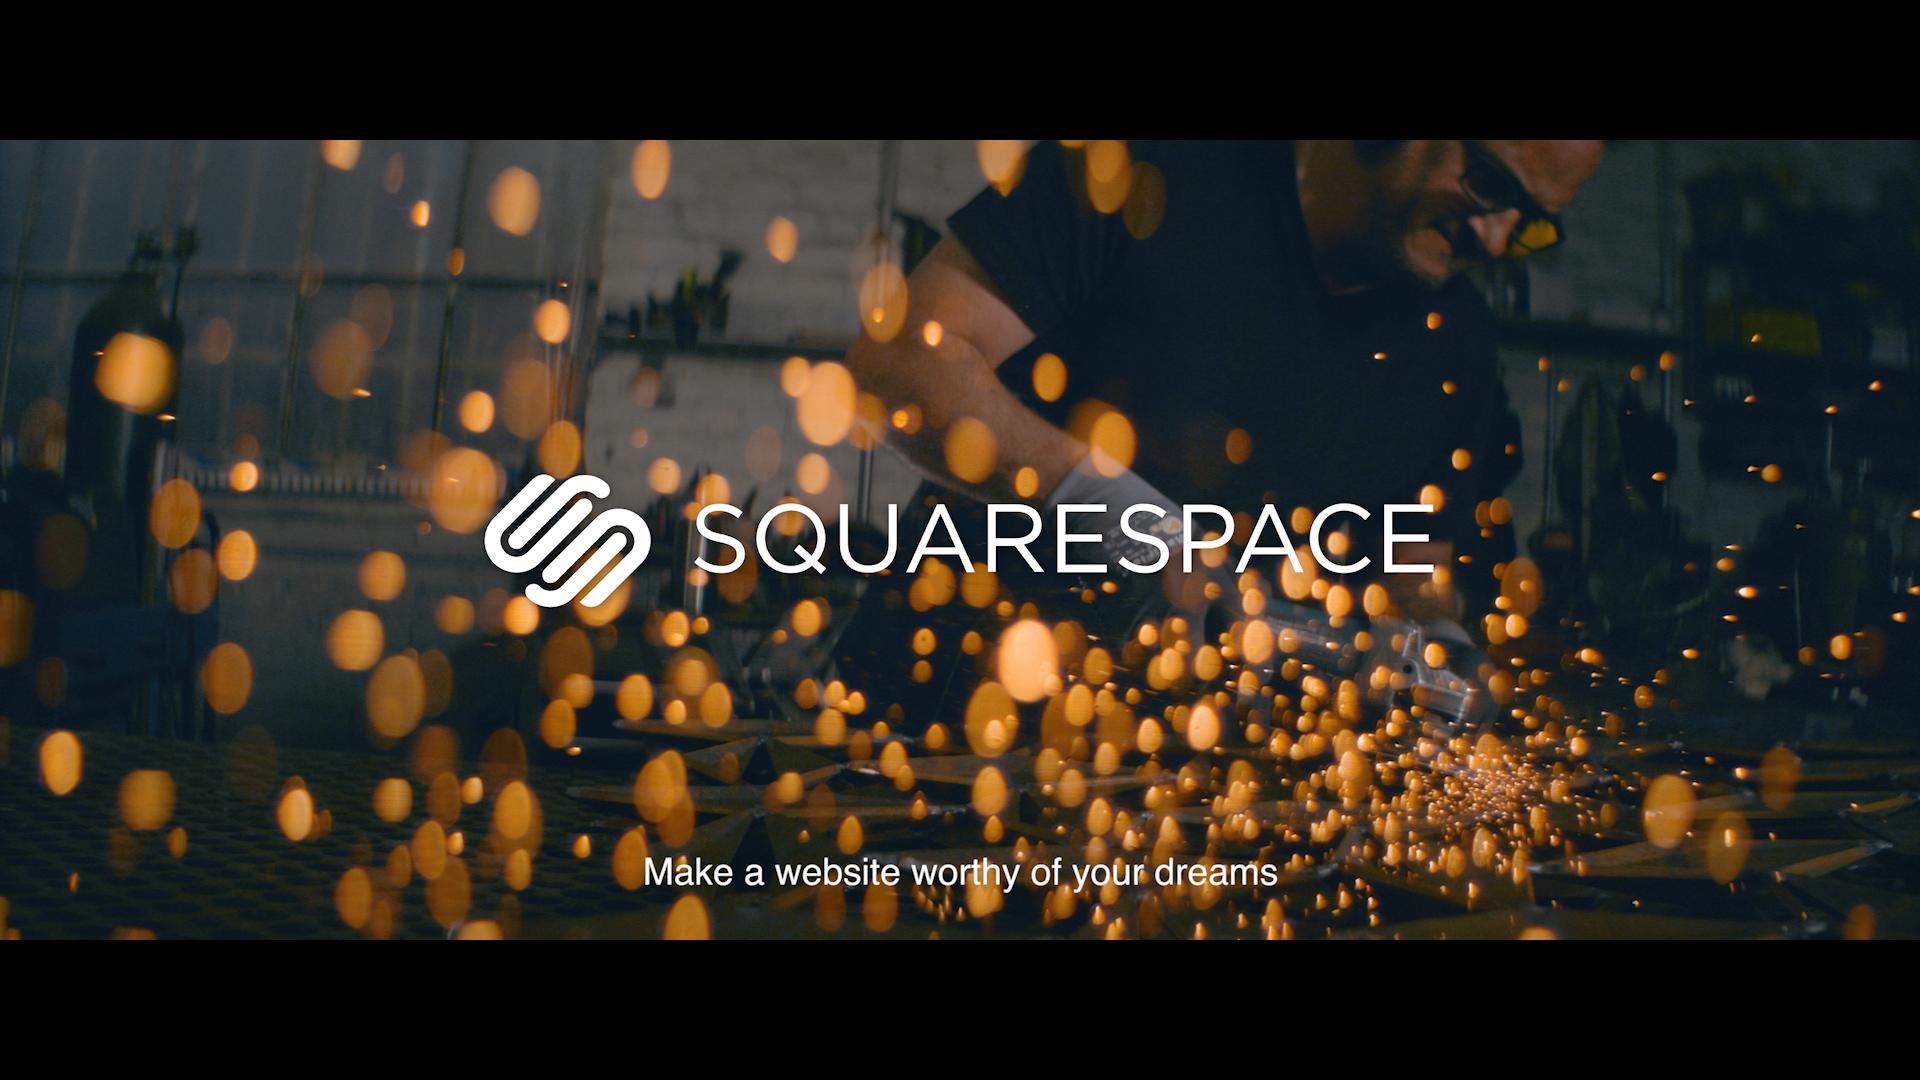 Squarespace Commercial.00_01_05_15.Still062.jpg